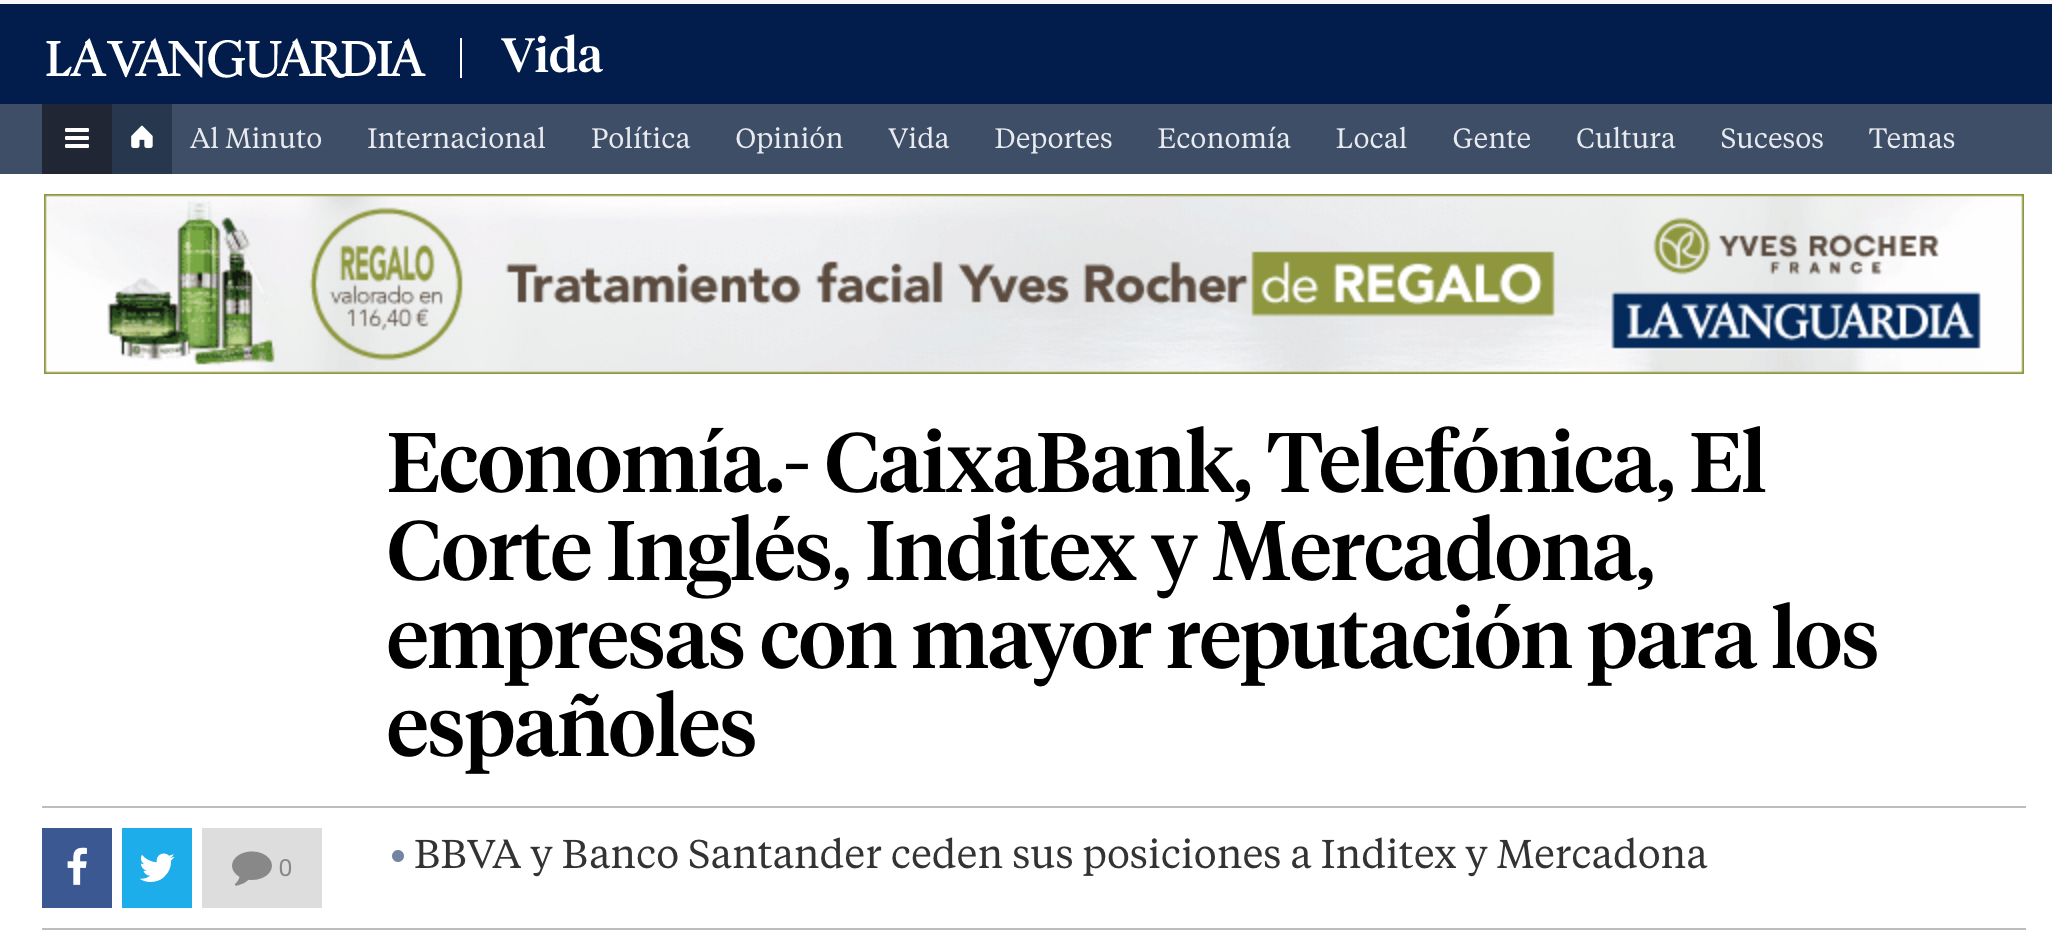 Noticia sobre el Estudio Advice en La Vanguardia